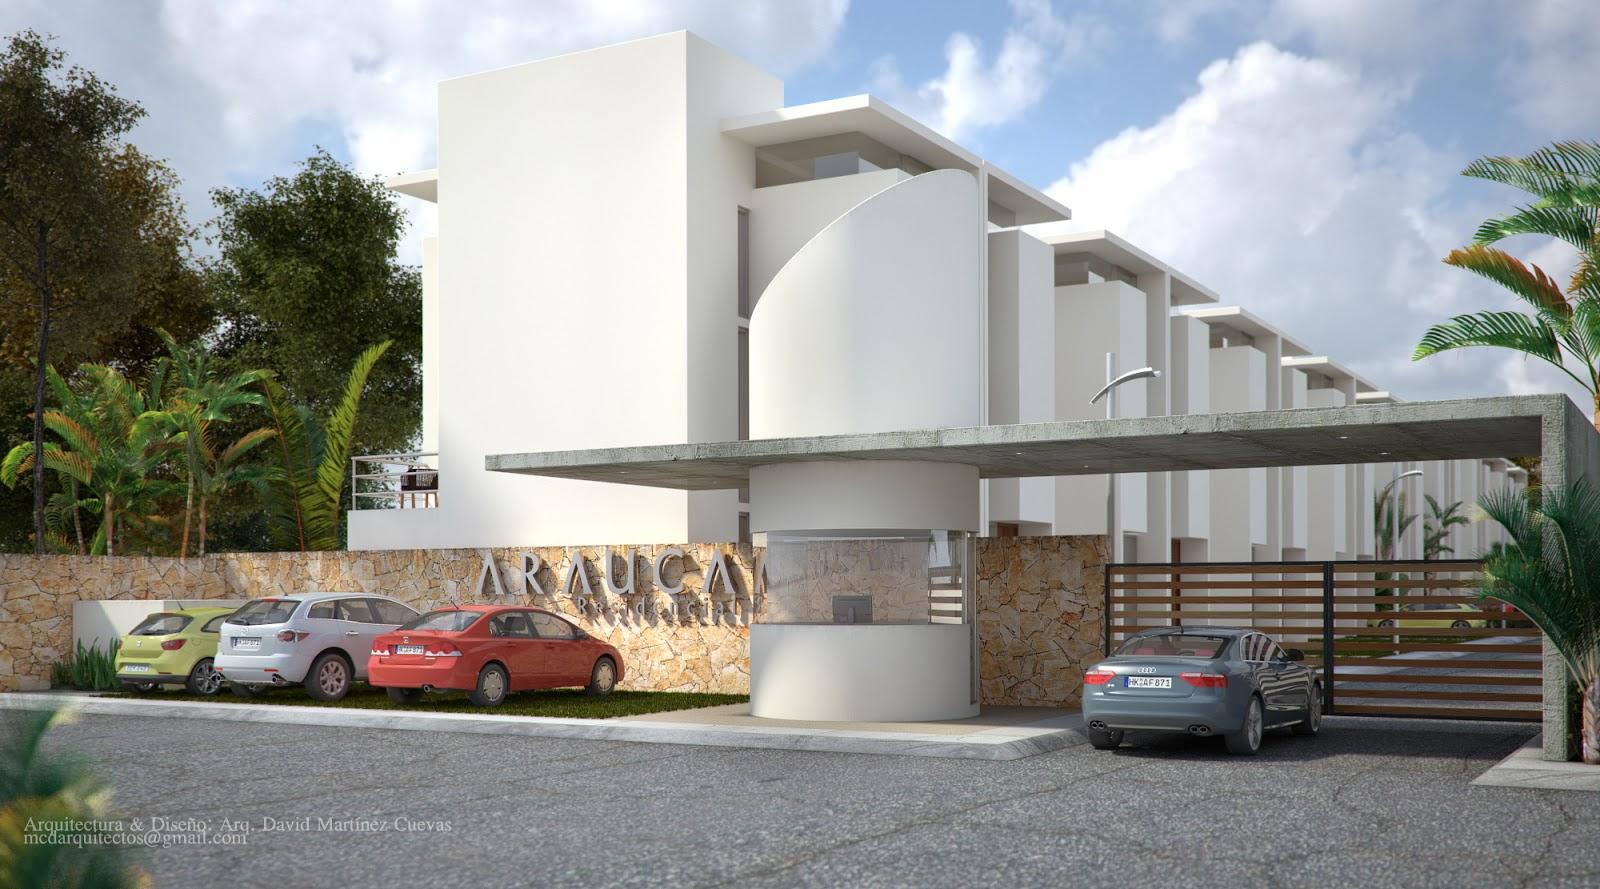 Arquitectura visualizaci n y 3d arauca residencial for Accesos arquitectura